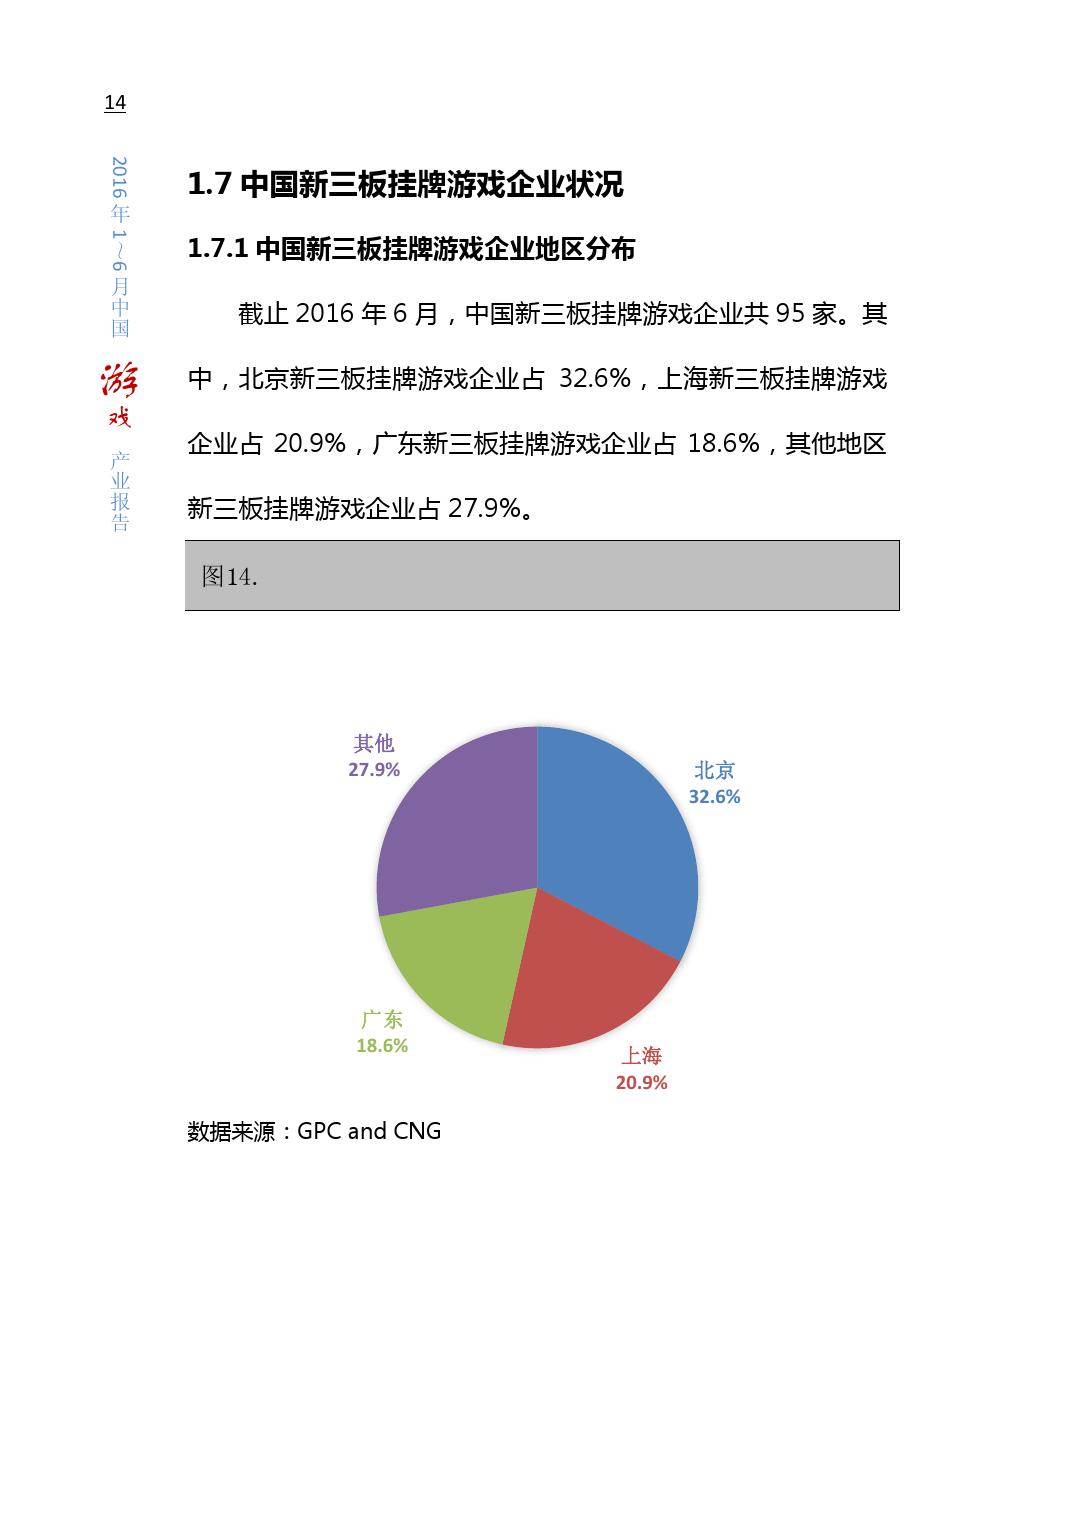 2016%e5%b9%b41-6%e6%9c%88%e4%b8%ad%e5%9b%bd%e4%ba%a7%e4%b8%9a%e6%b8%b8%e6%88%8f%e6%8a%a5%e5%91%8a_000028